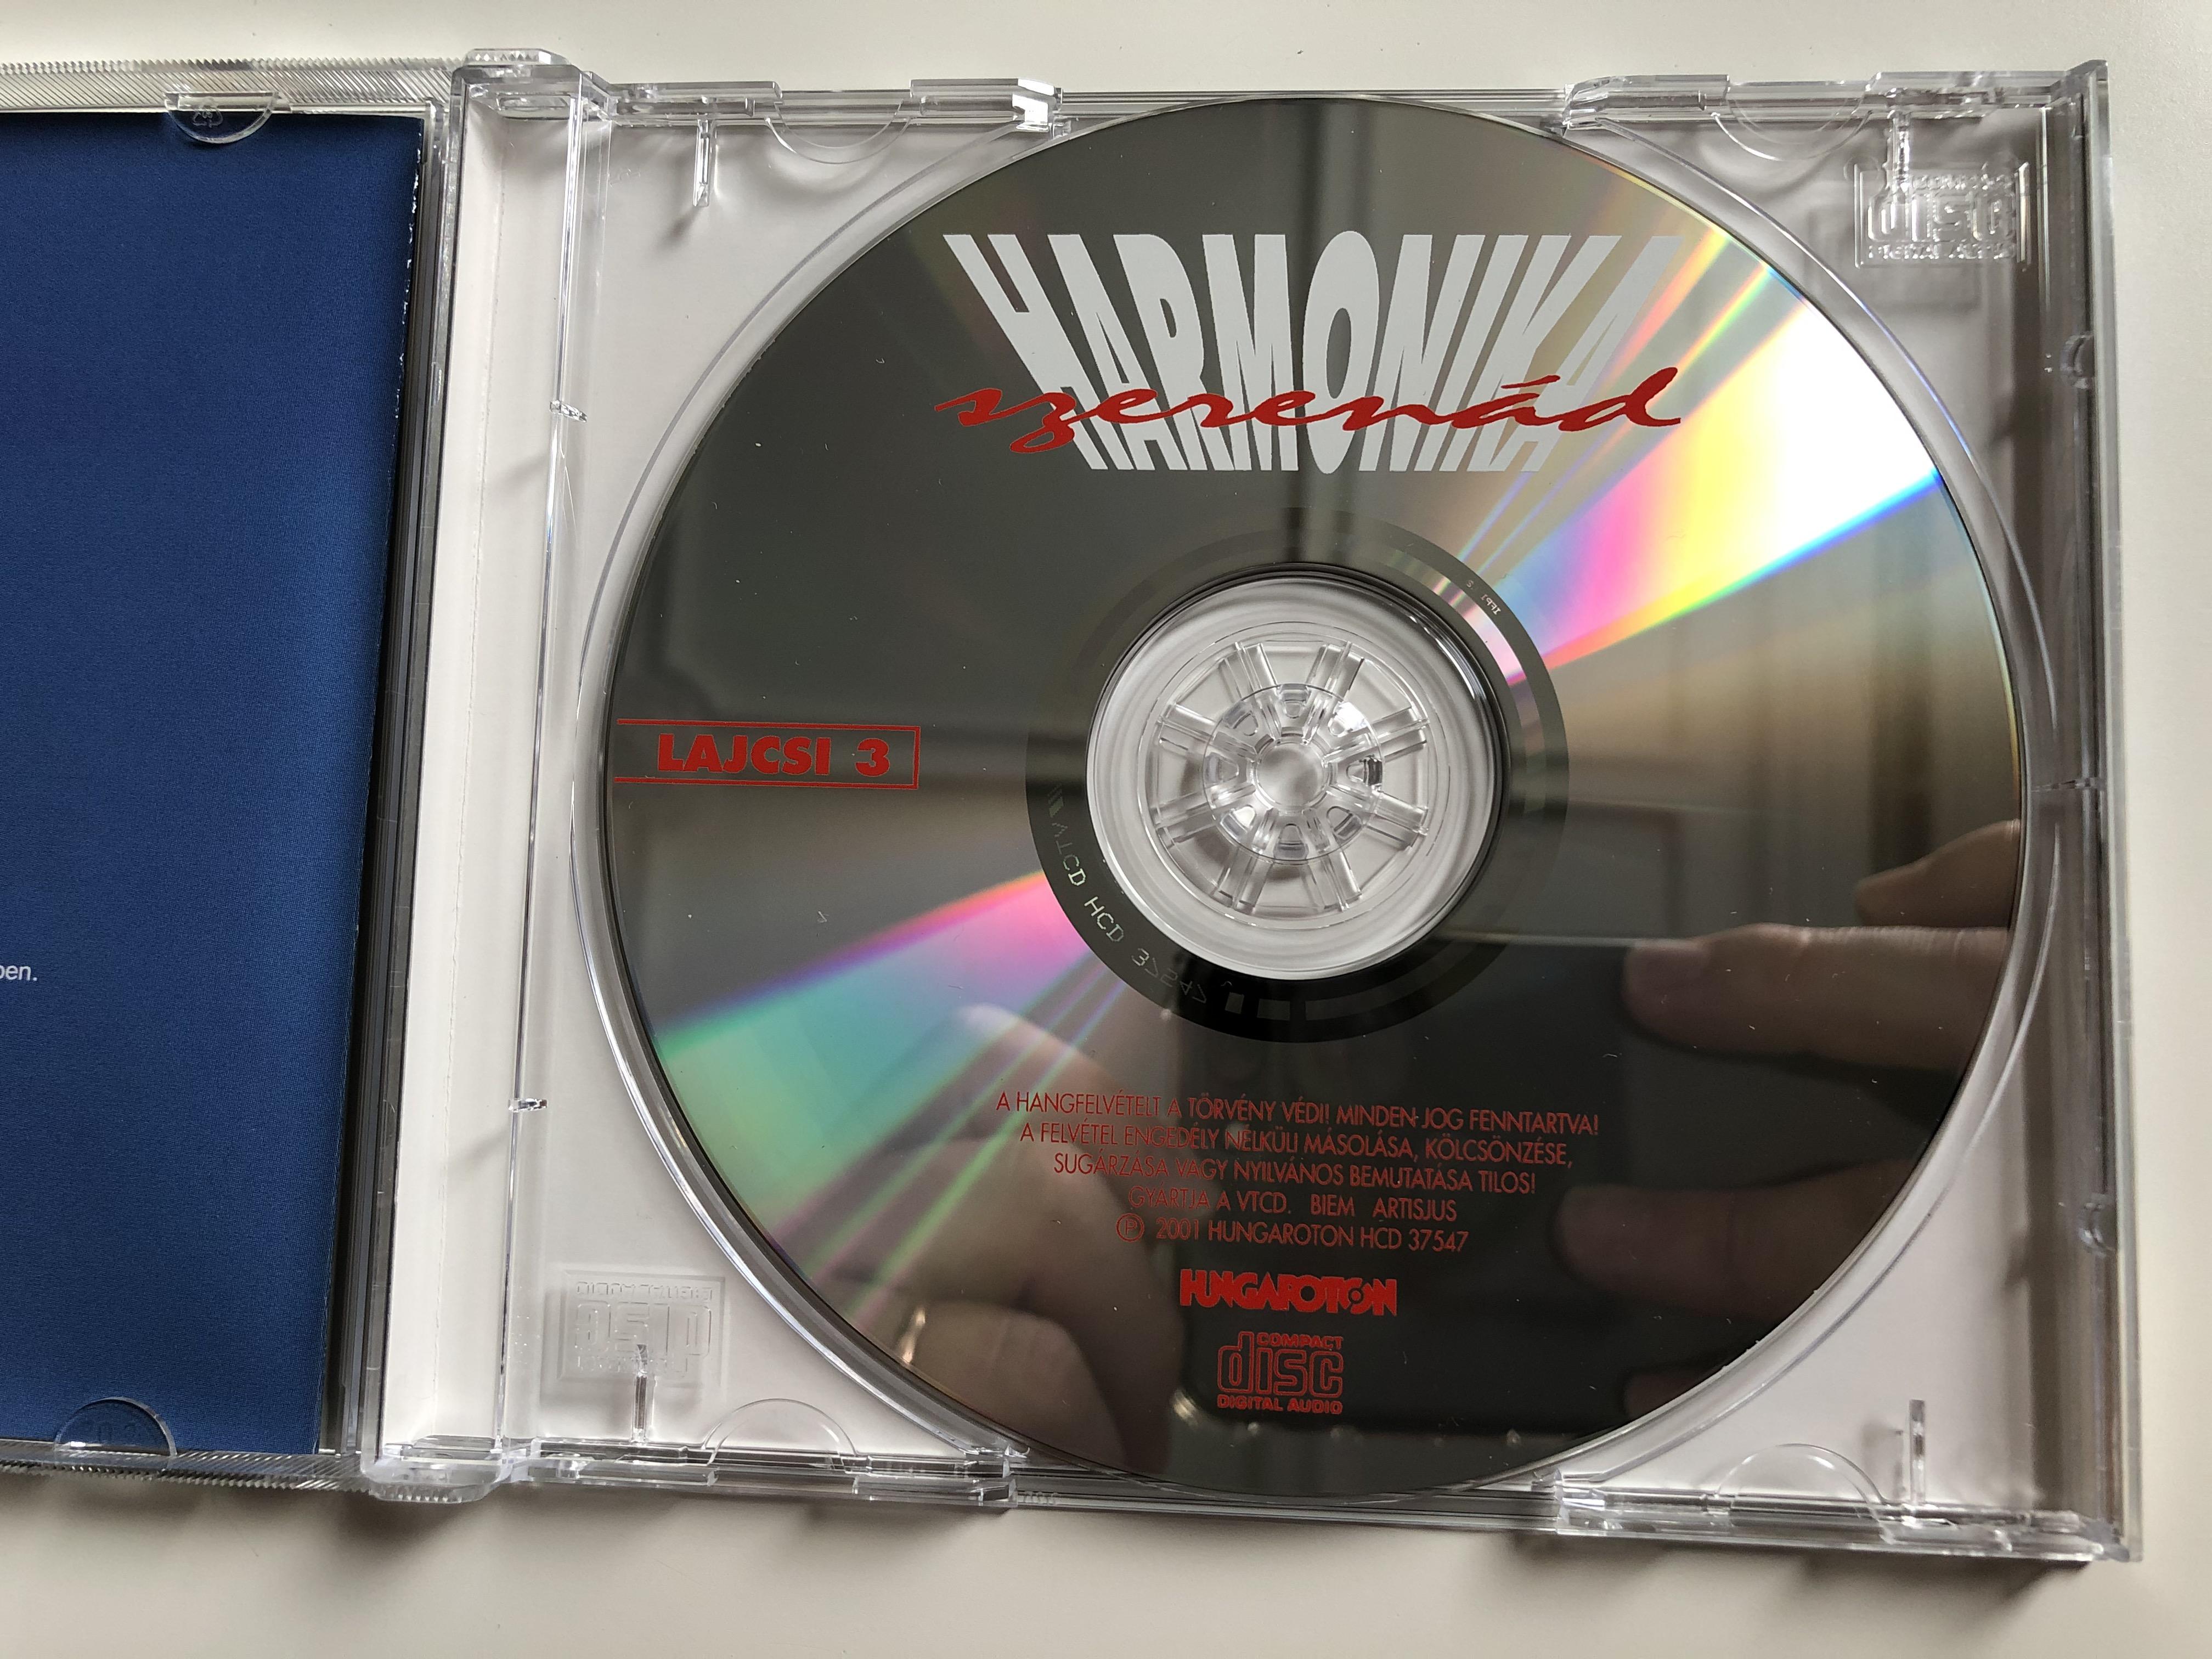 lagzi-lajcsi-3-harmonika-szeren-d-la-cucaracha-gyertyaf-ny-kering-el-condor-pasa-gy-ng-den-lelj-t-la-paloma-hungaroton-audio-cd-2001-hcd-37547-4-.jpg